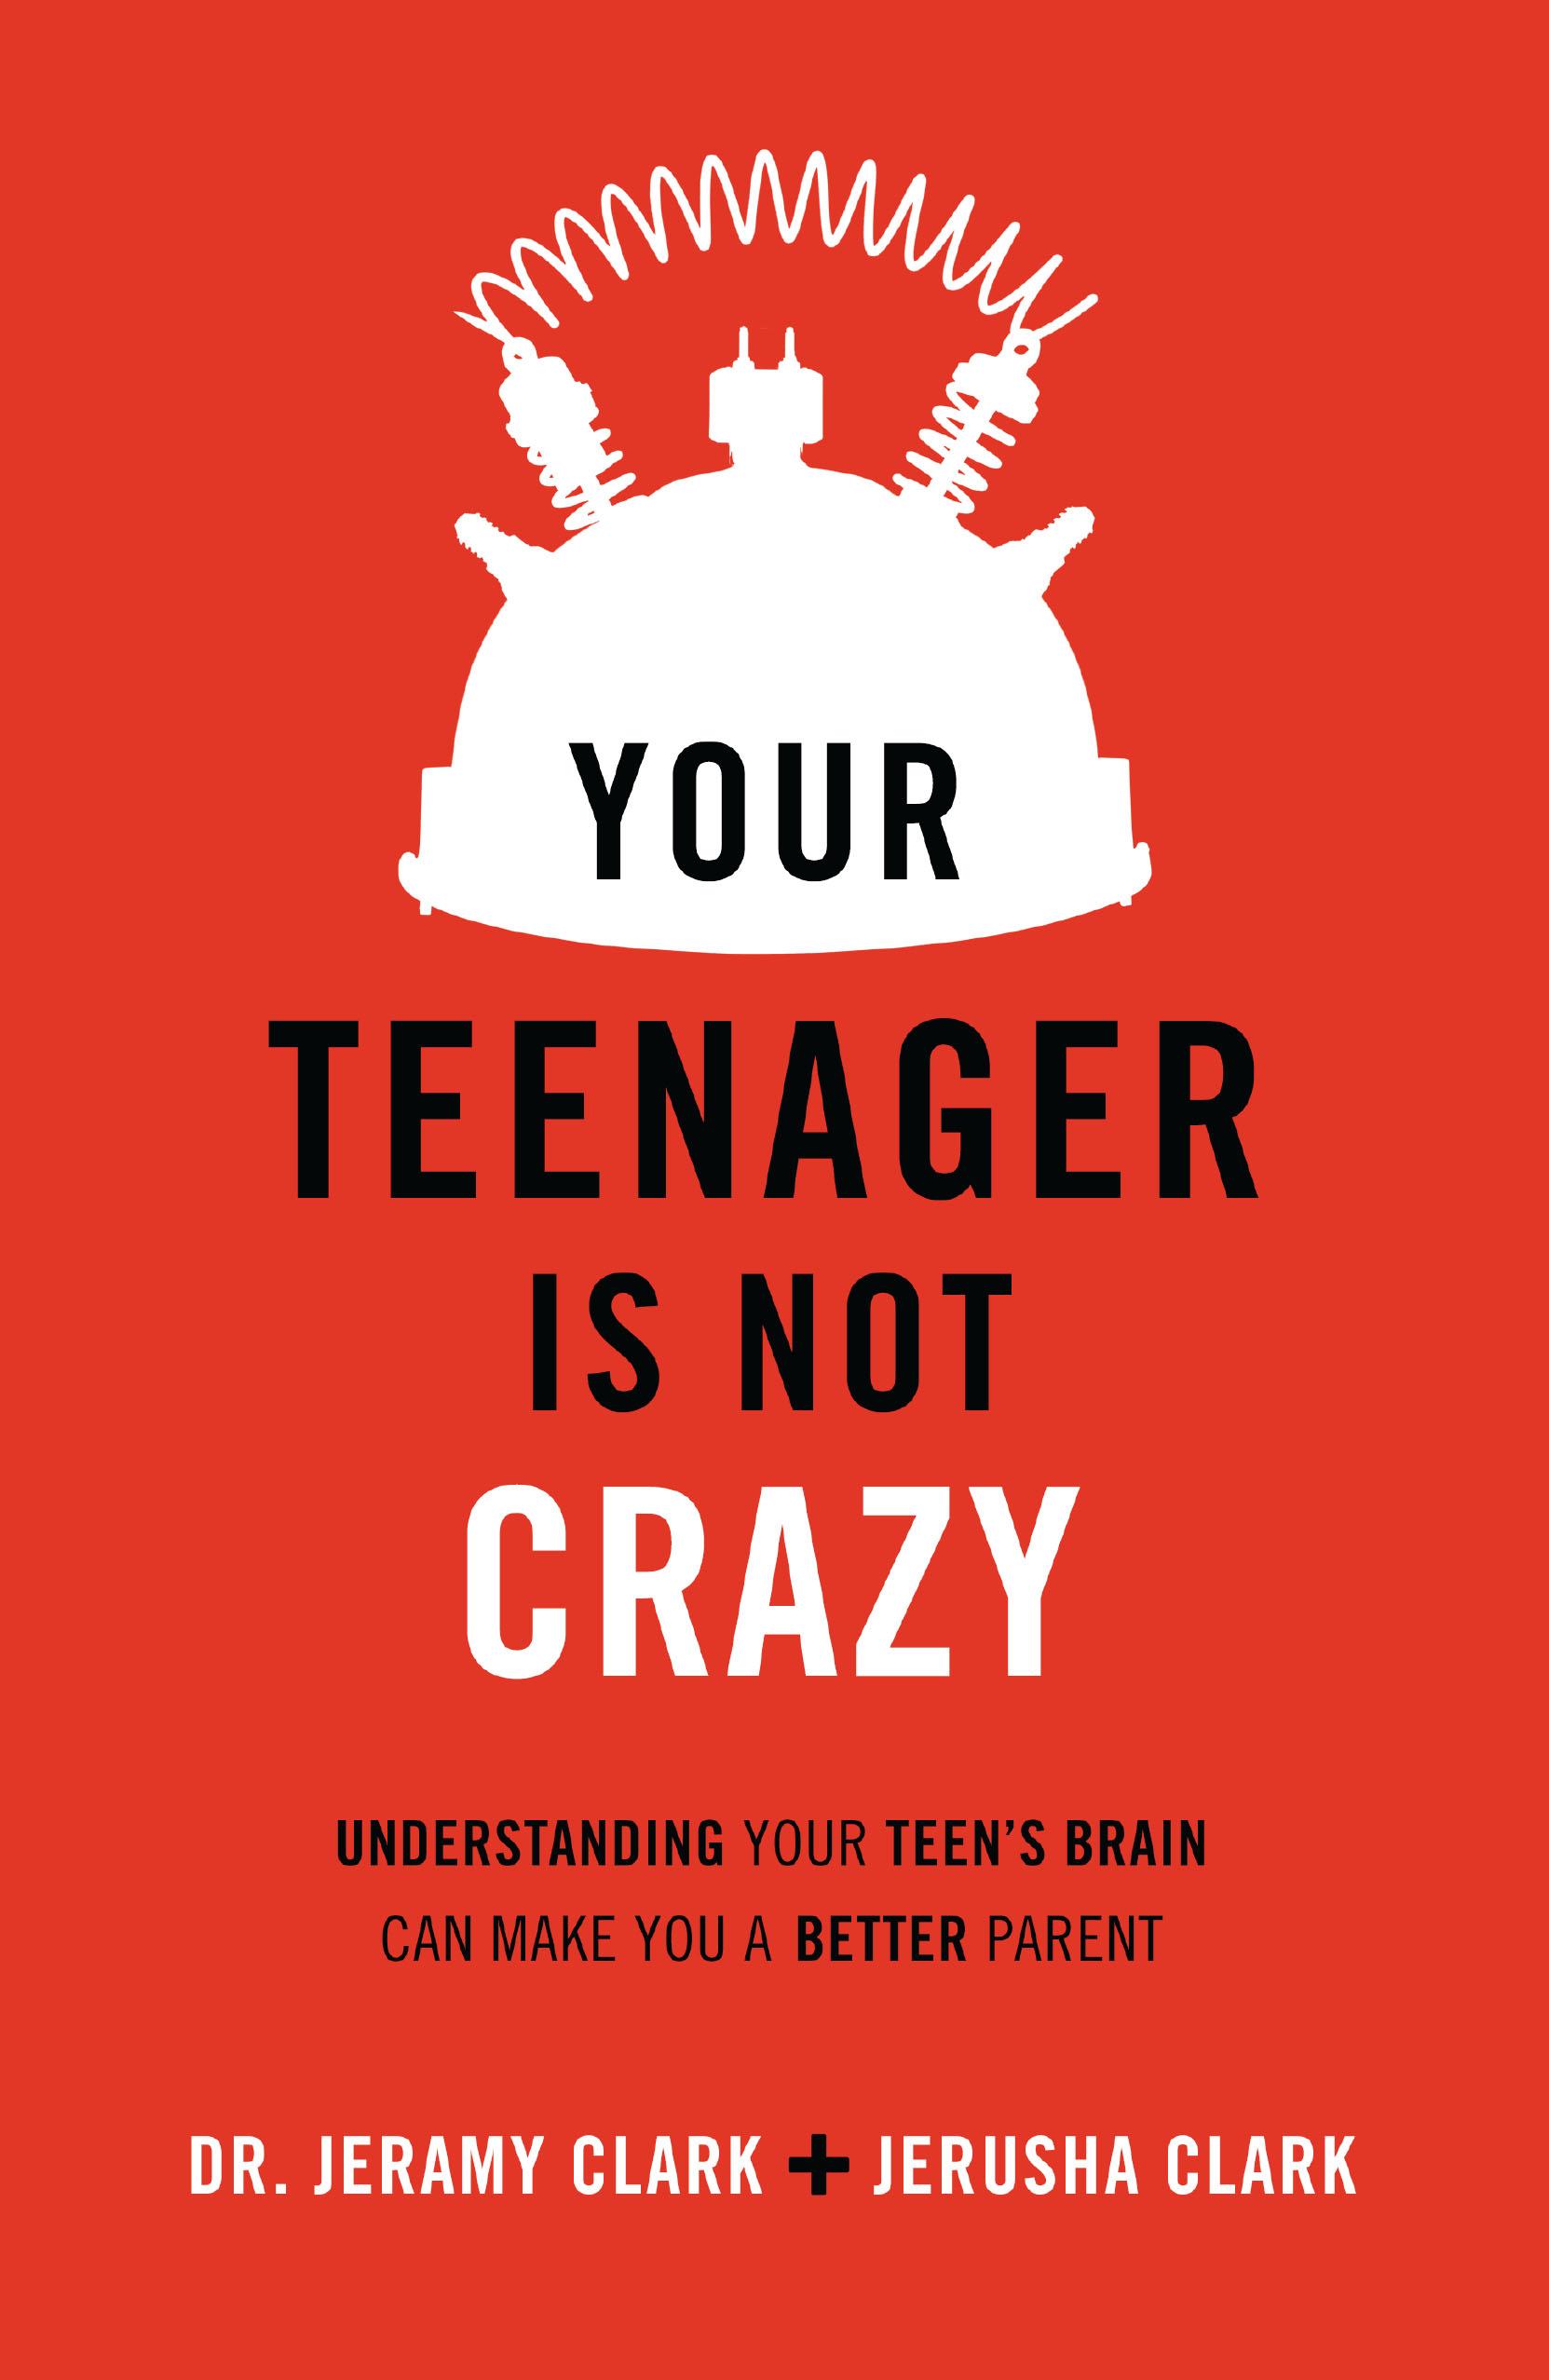 TeenagerNotCrazy.indd